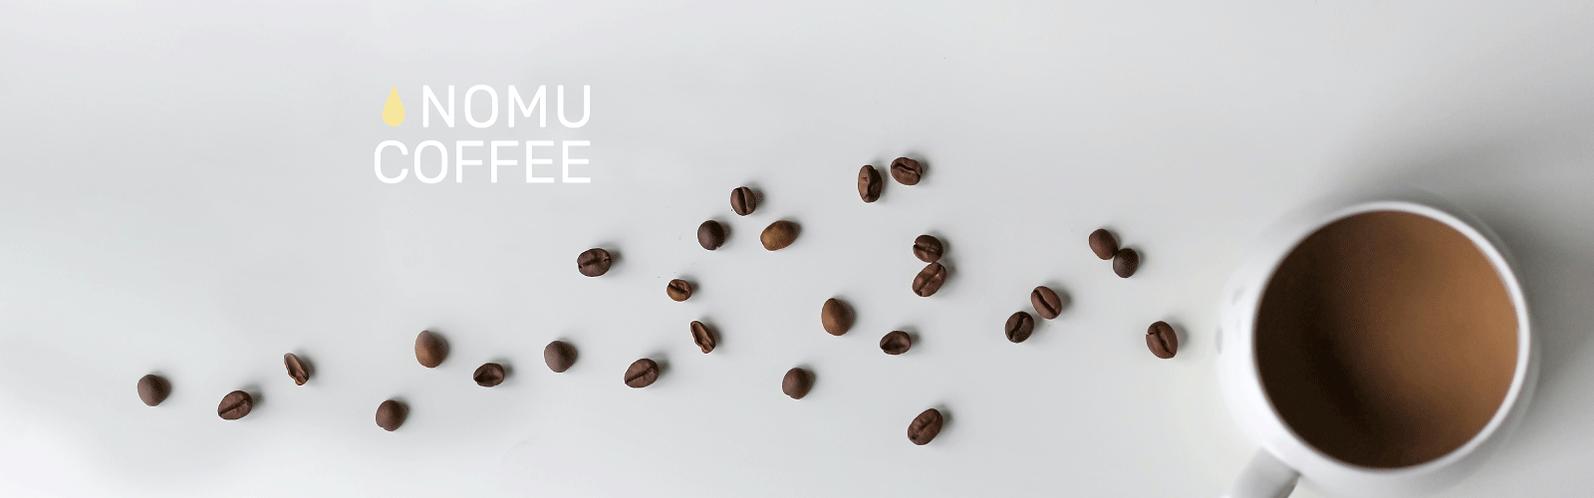 nomu coffee brand identity design